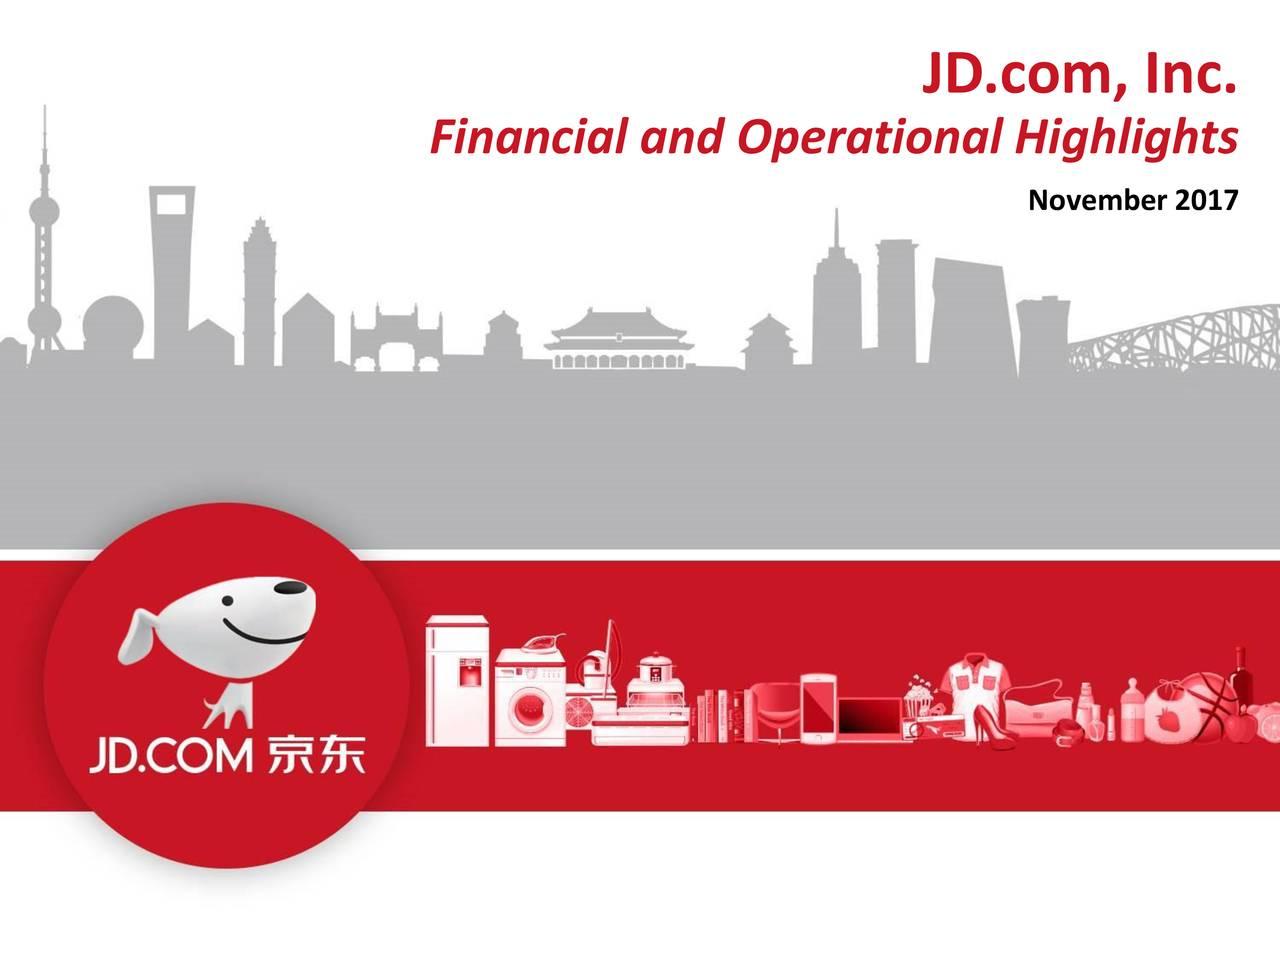 Financial and Operational Highlights November 2017